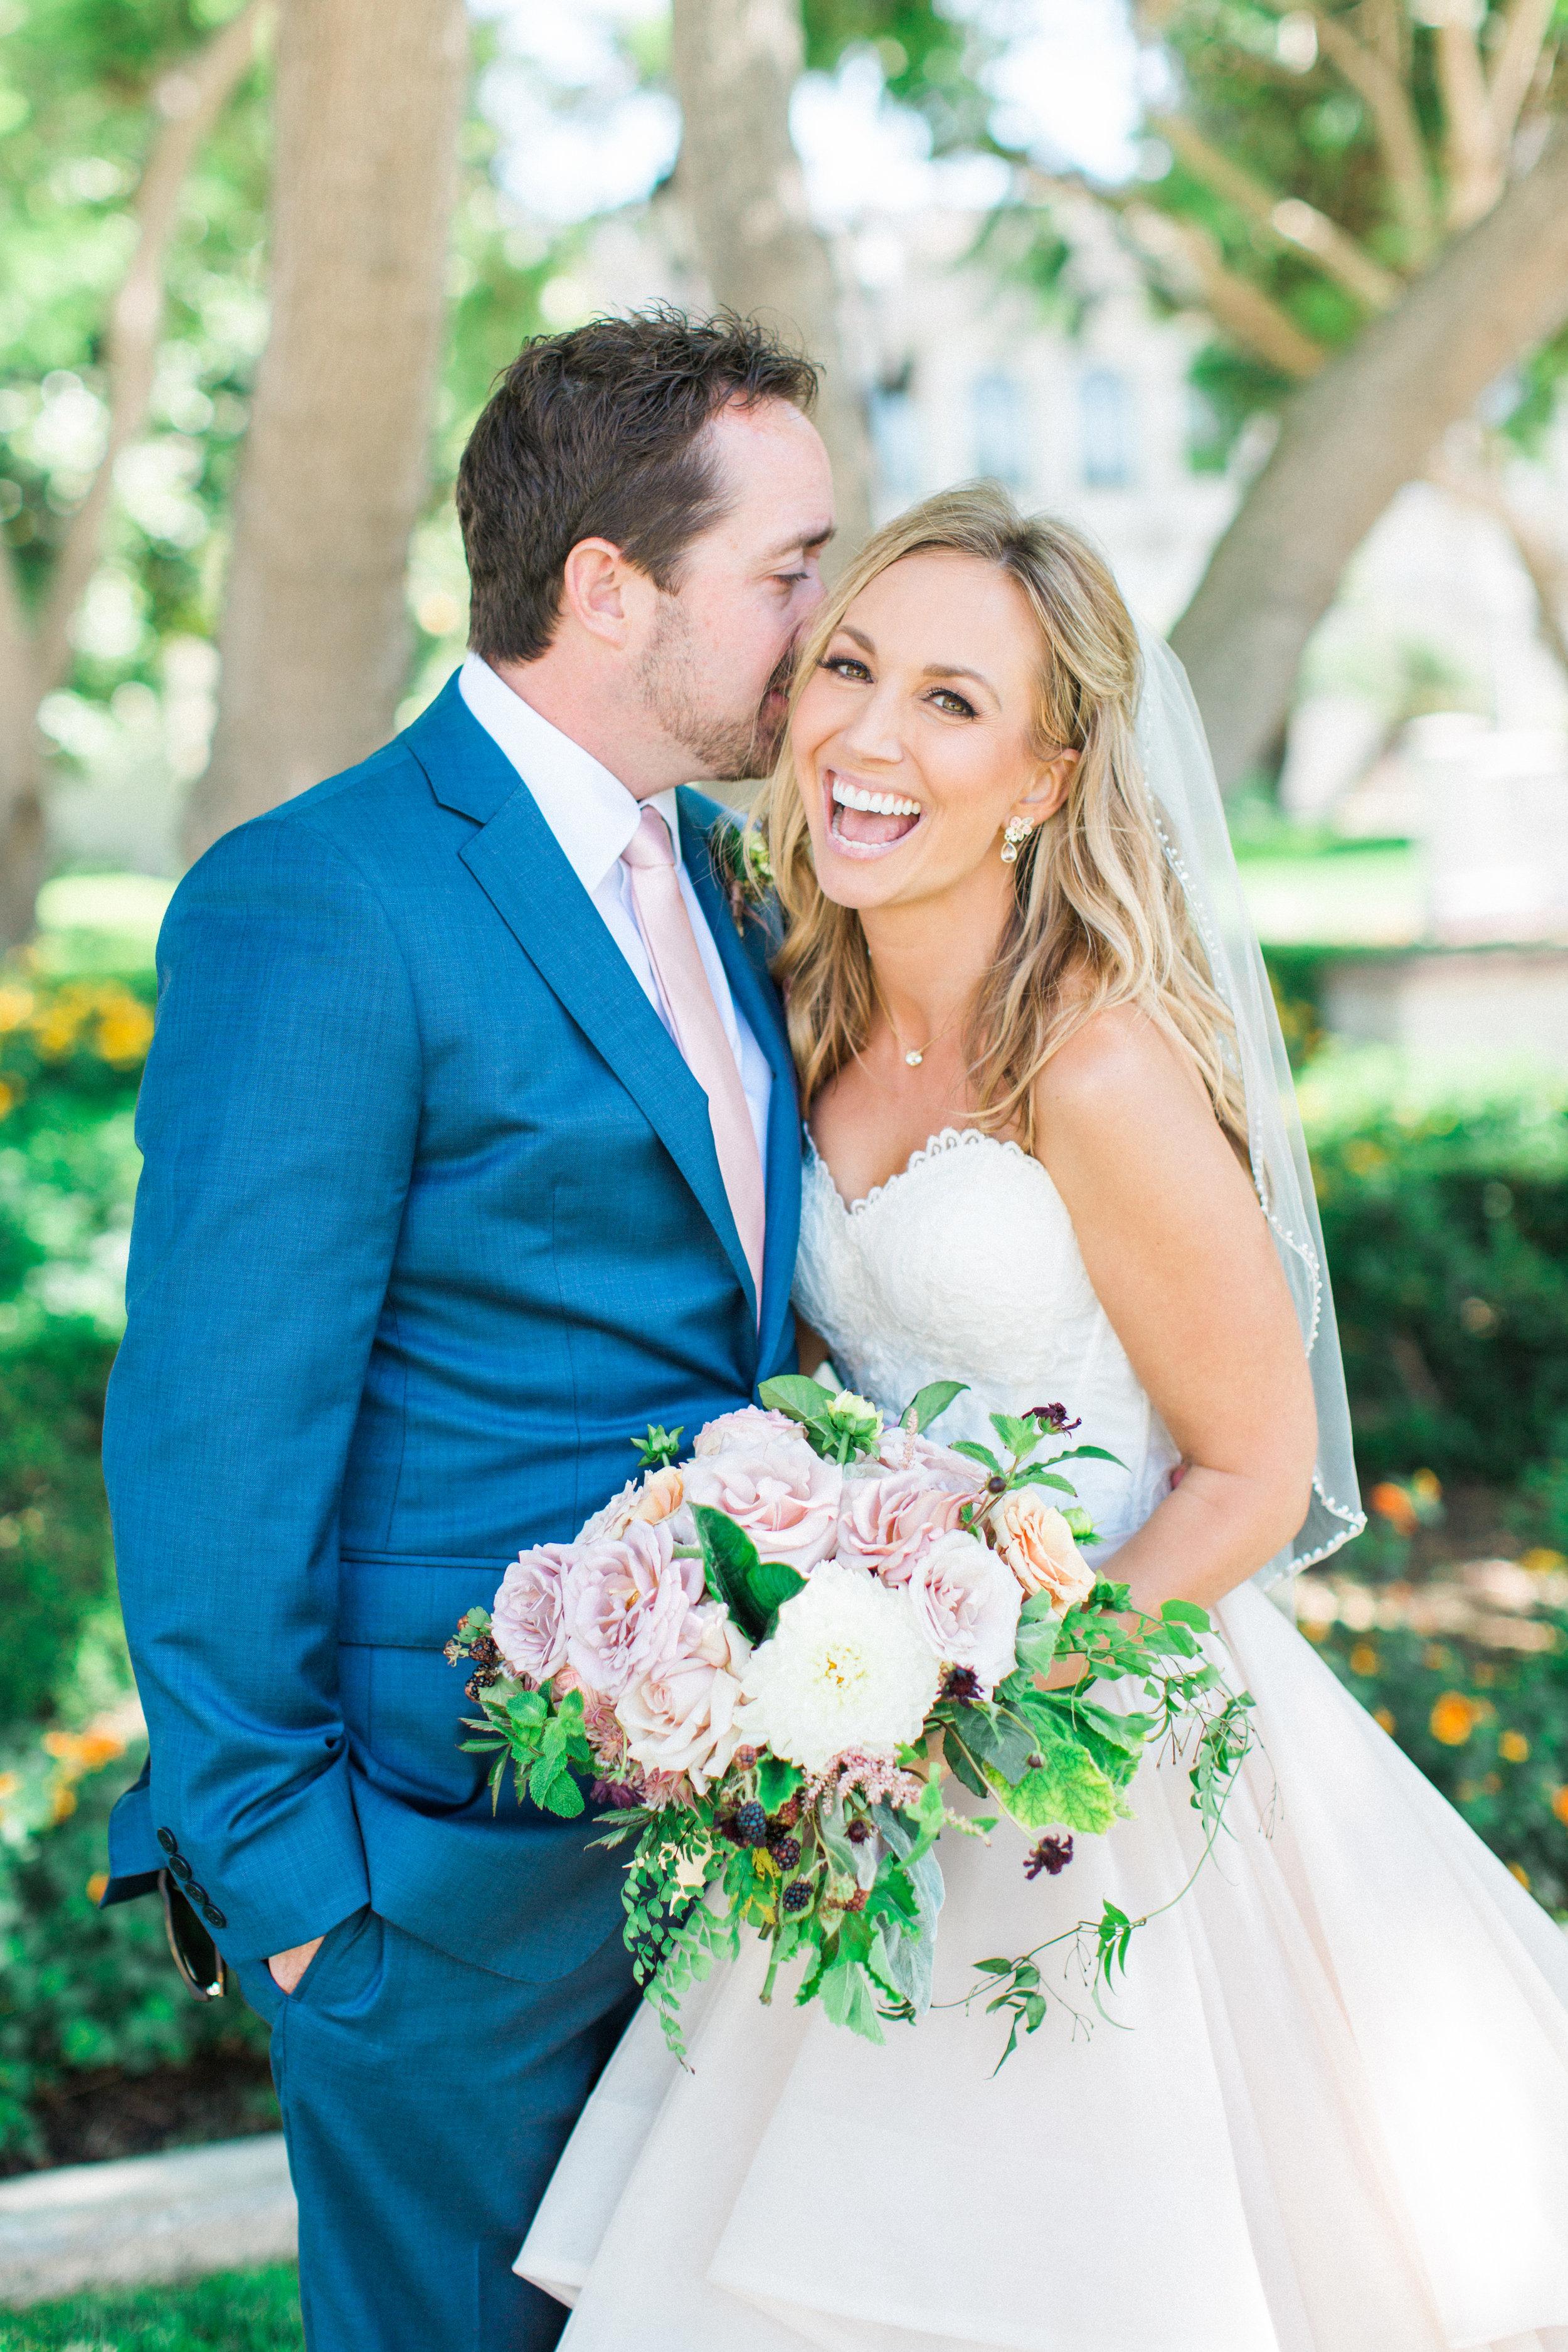 Blooms-breesa-lee-luxury-florist-aga-jones-tres-chic-affairs-san-diego-wedding-classic-coast-catering-(4).jpg